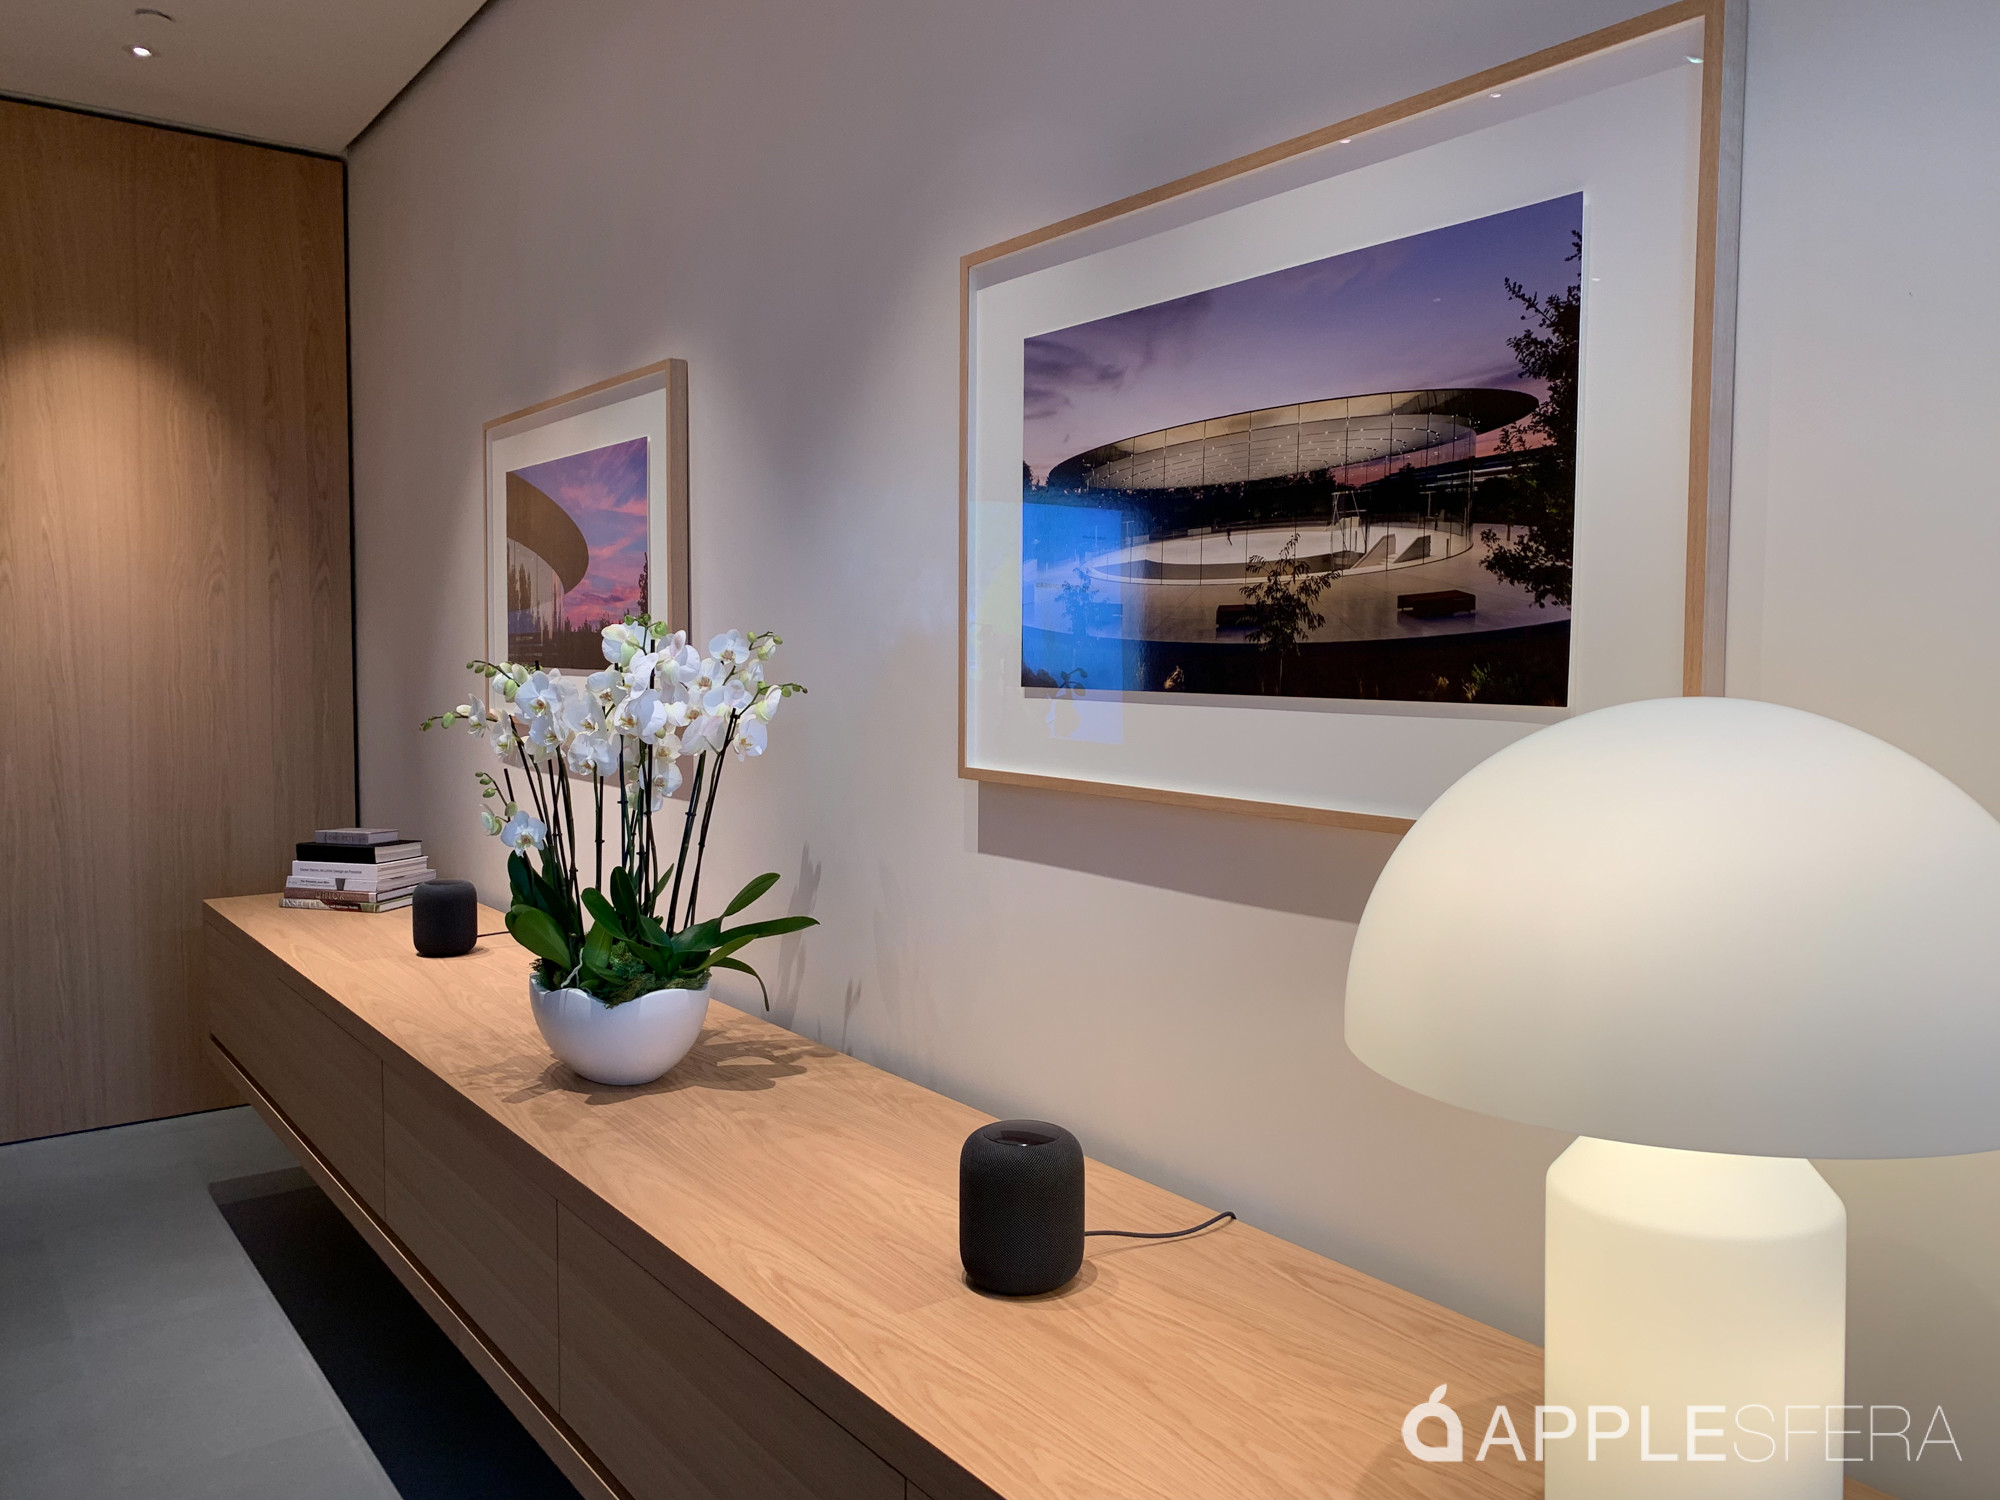 Foto de Apple Store Passeig de Gràcia (10/28)